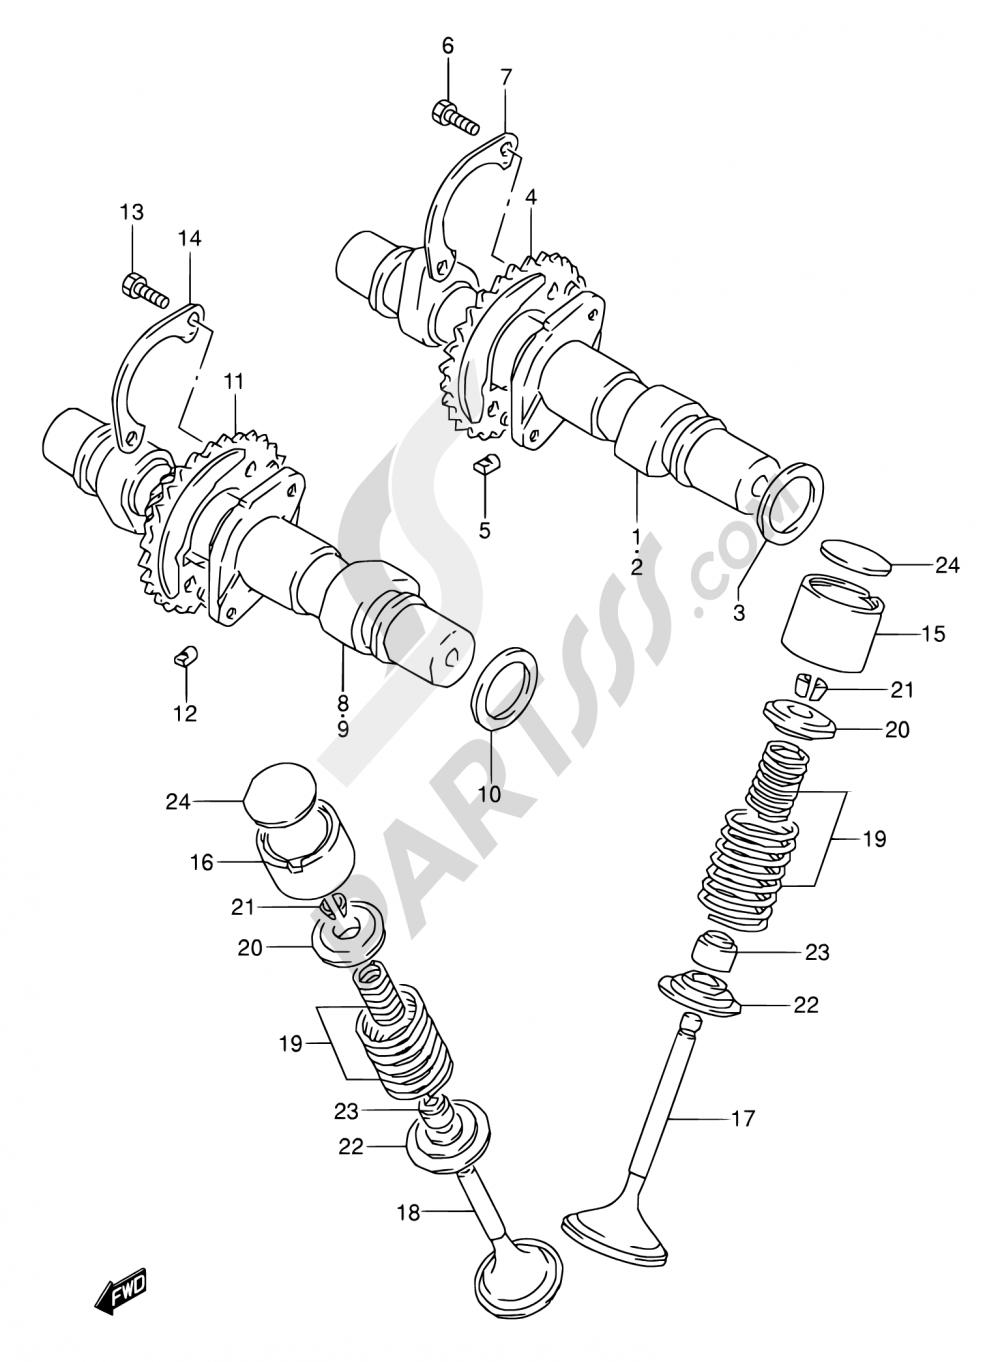 10 - CAM SHAFT - VALVE (MODEL K/L/M/N/P) Suzuki GS500E 1991